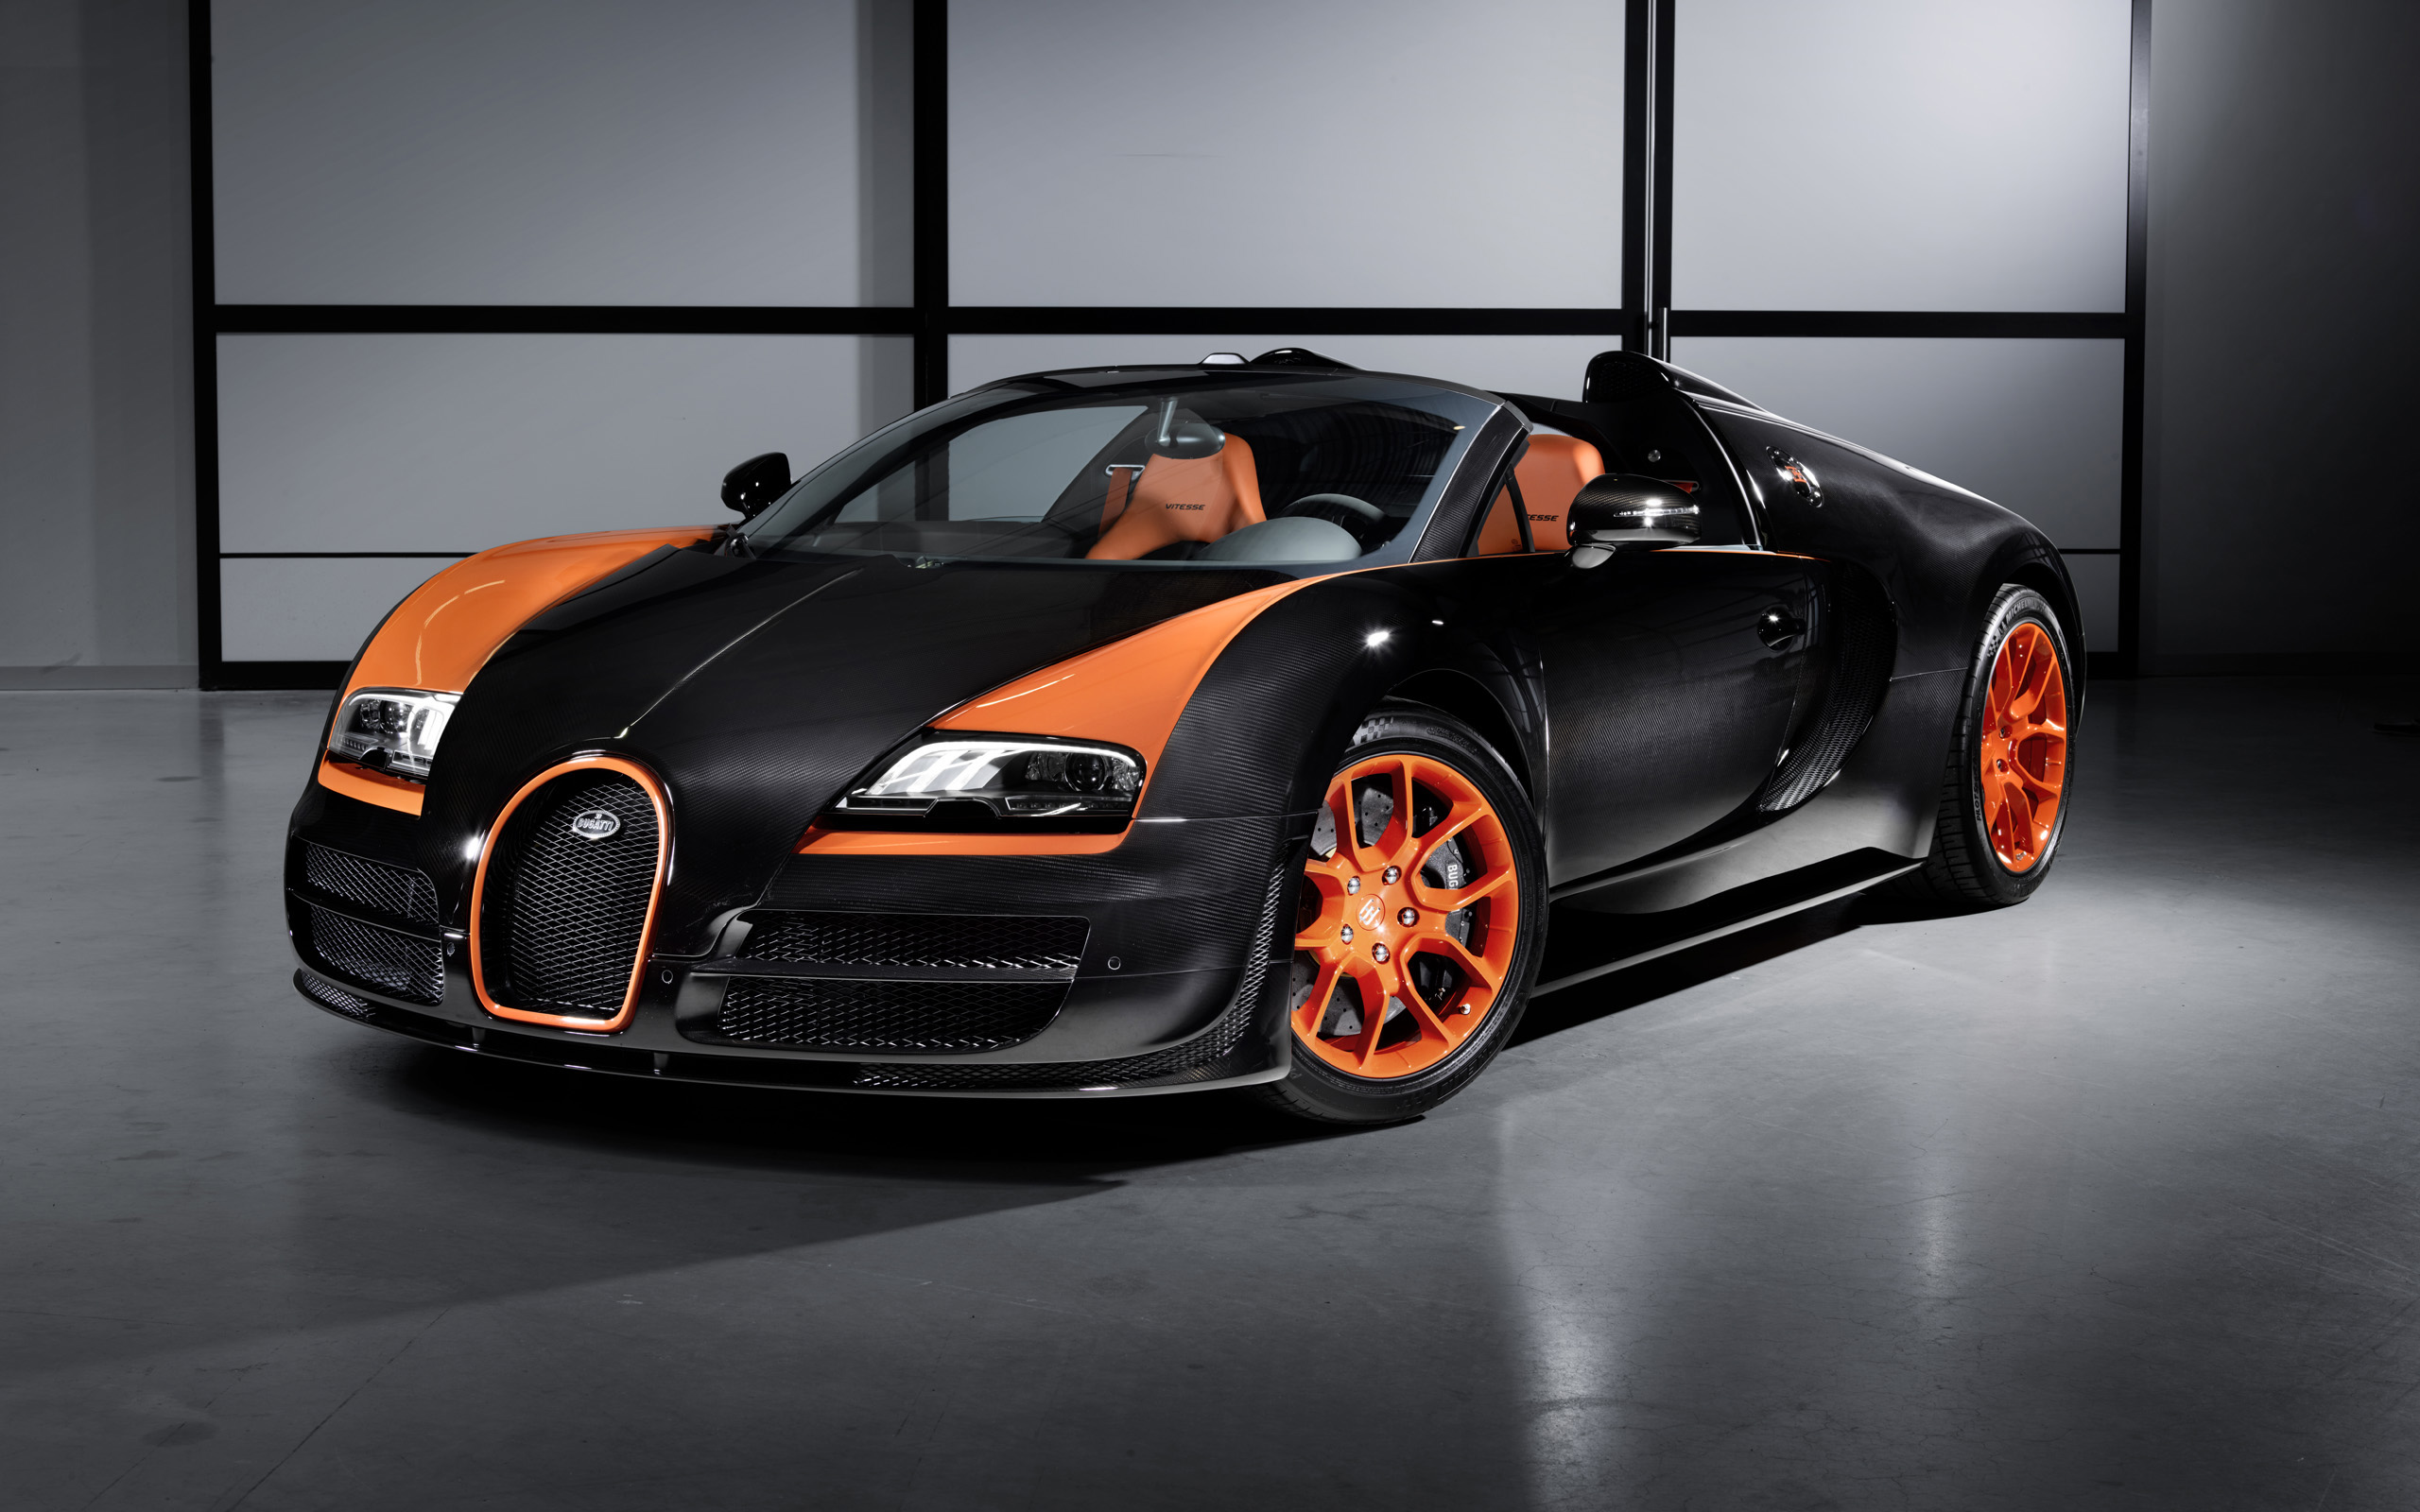 Bugatti Veyron Full HD Wallpaper And Background Image